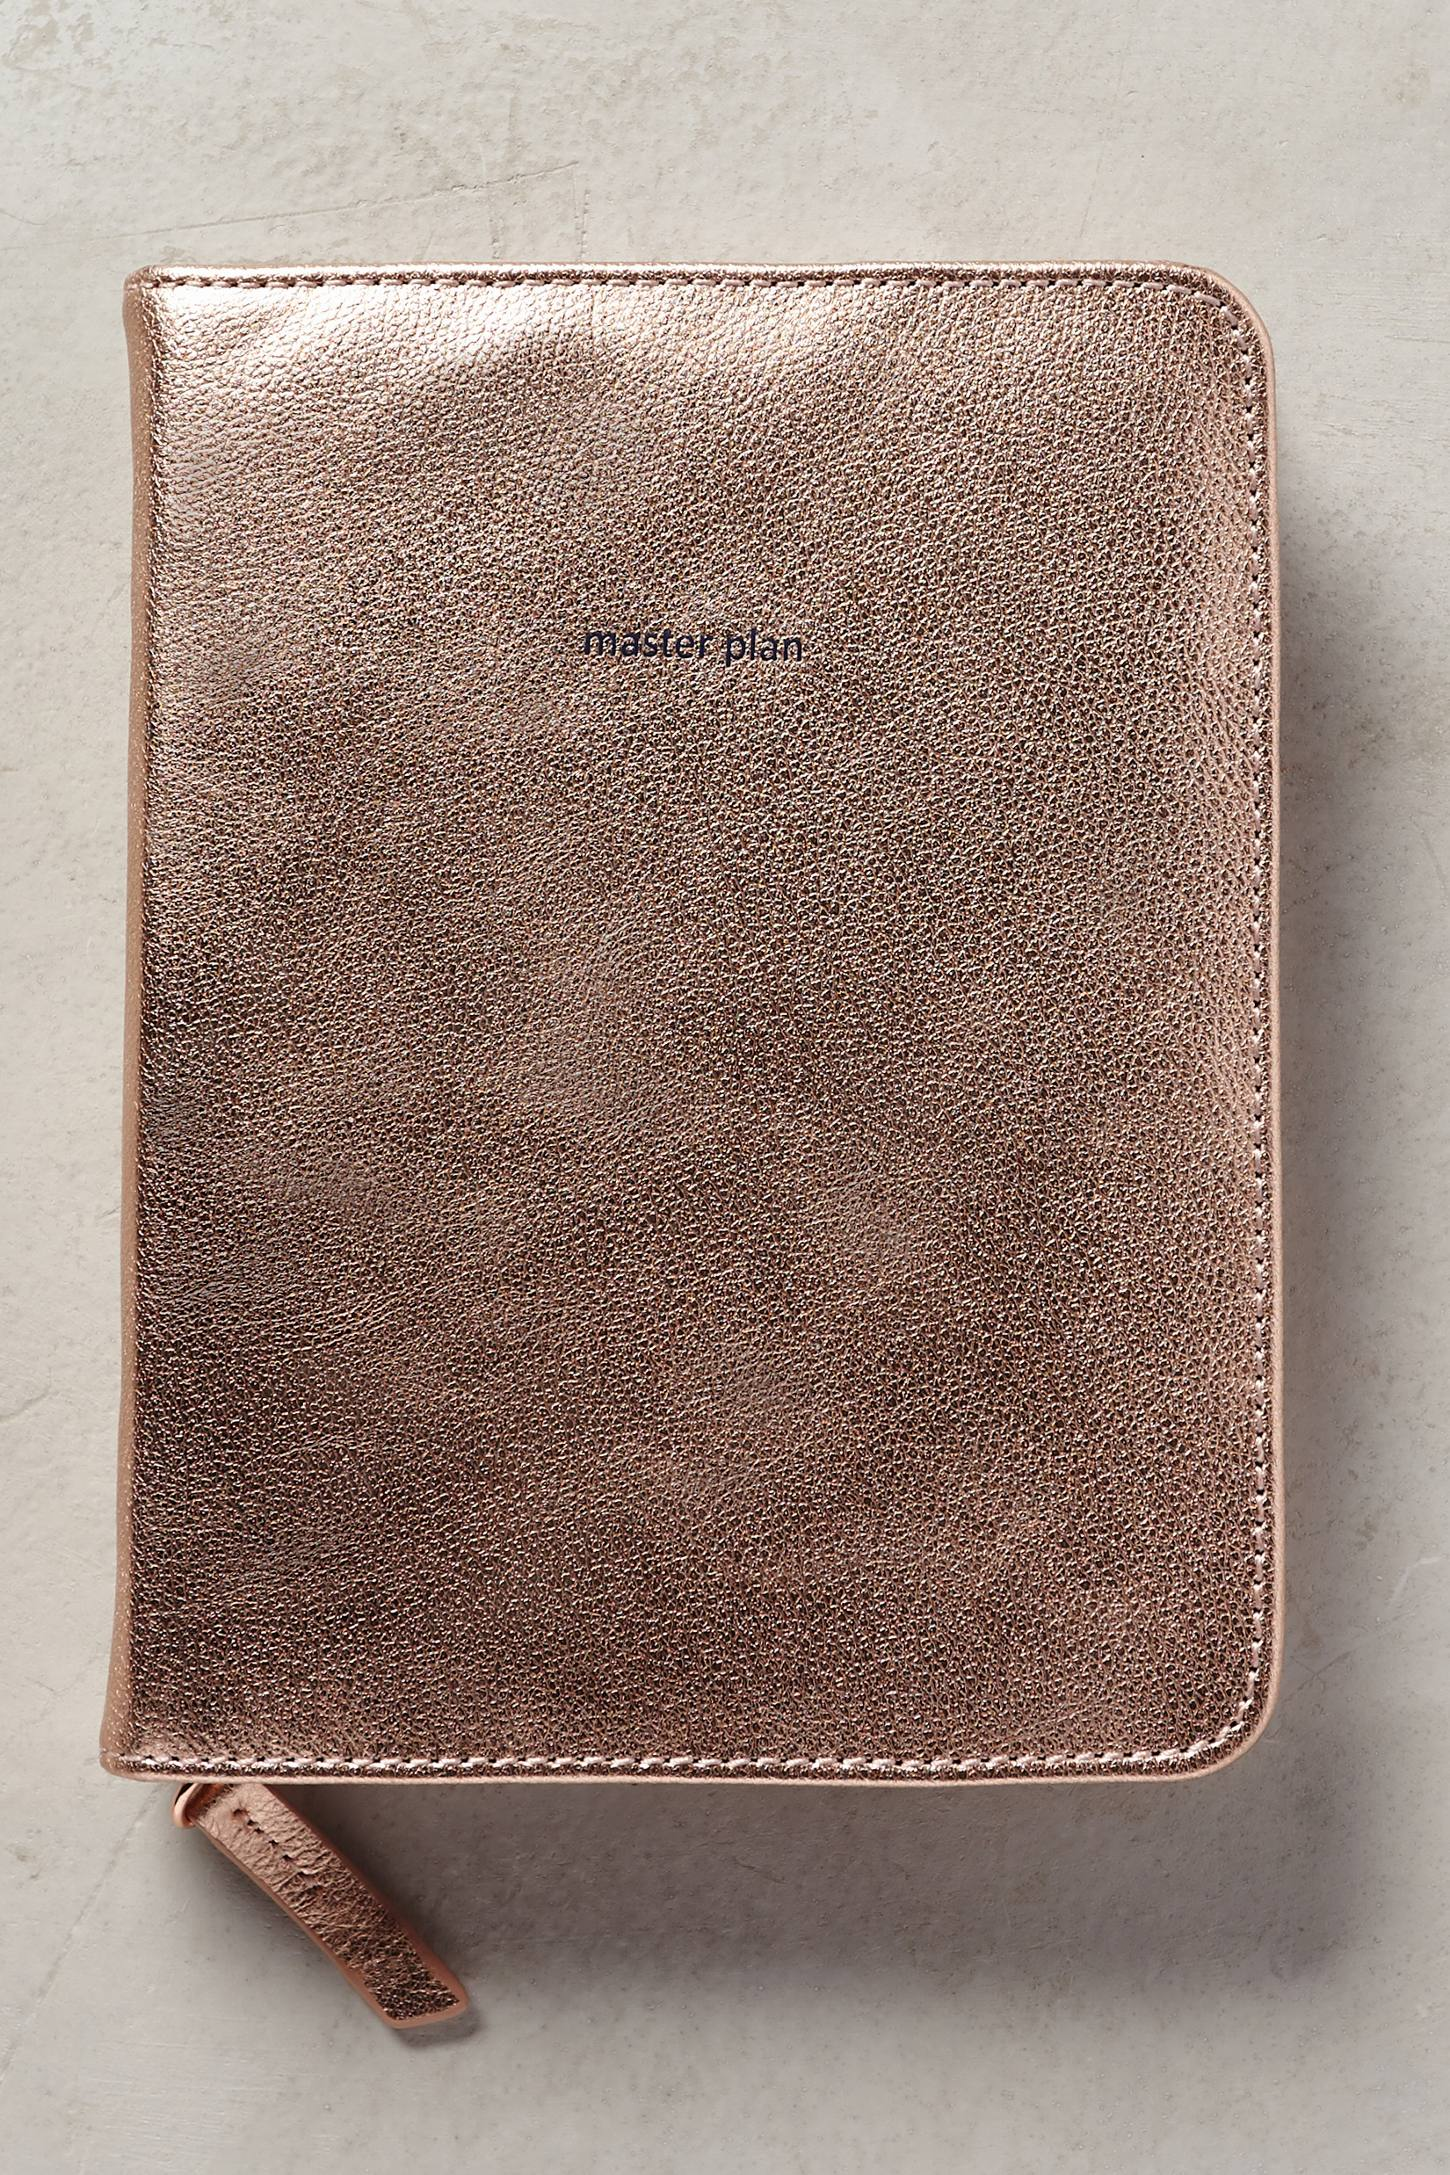 Gilded Anglophile Journal